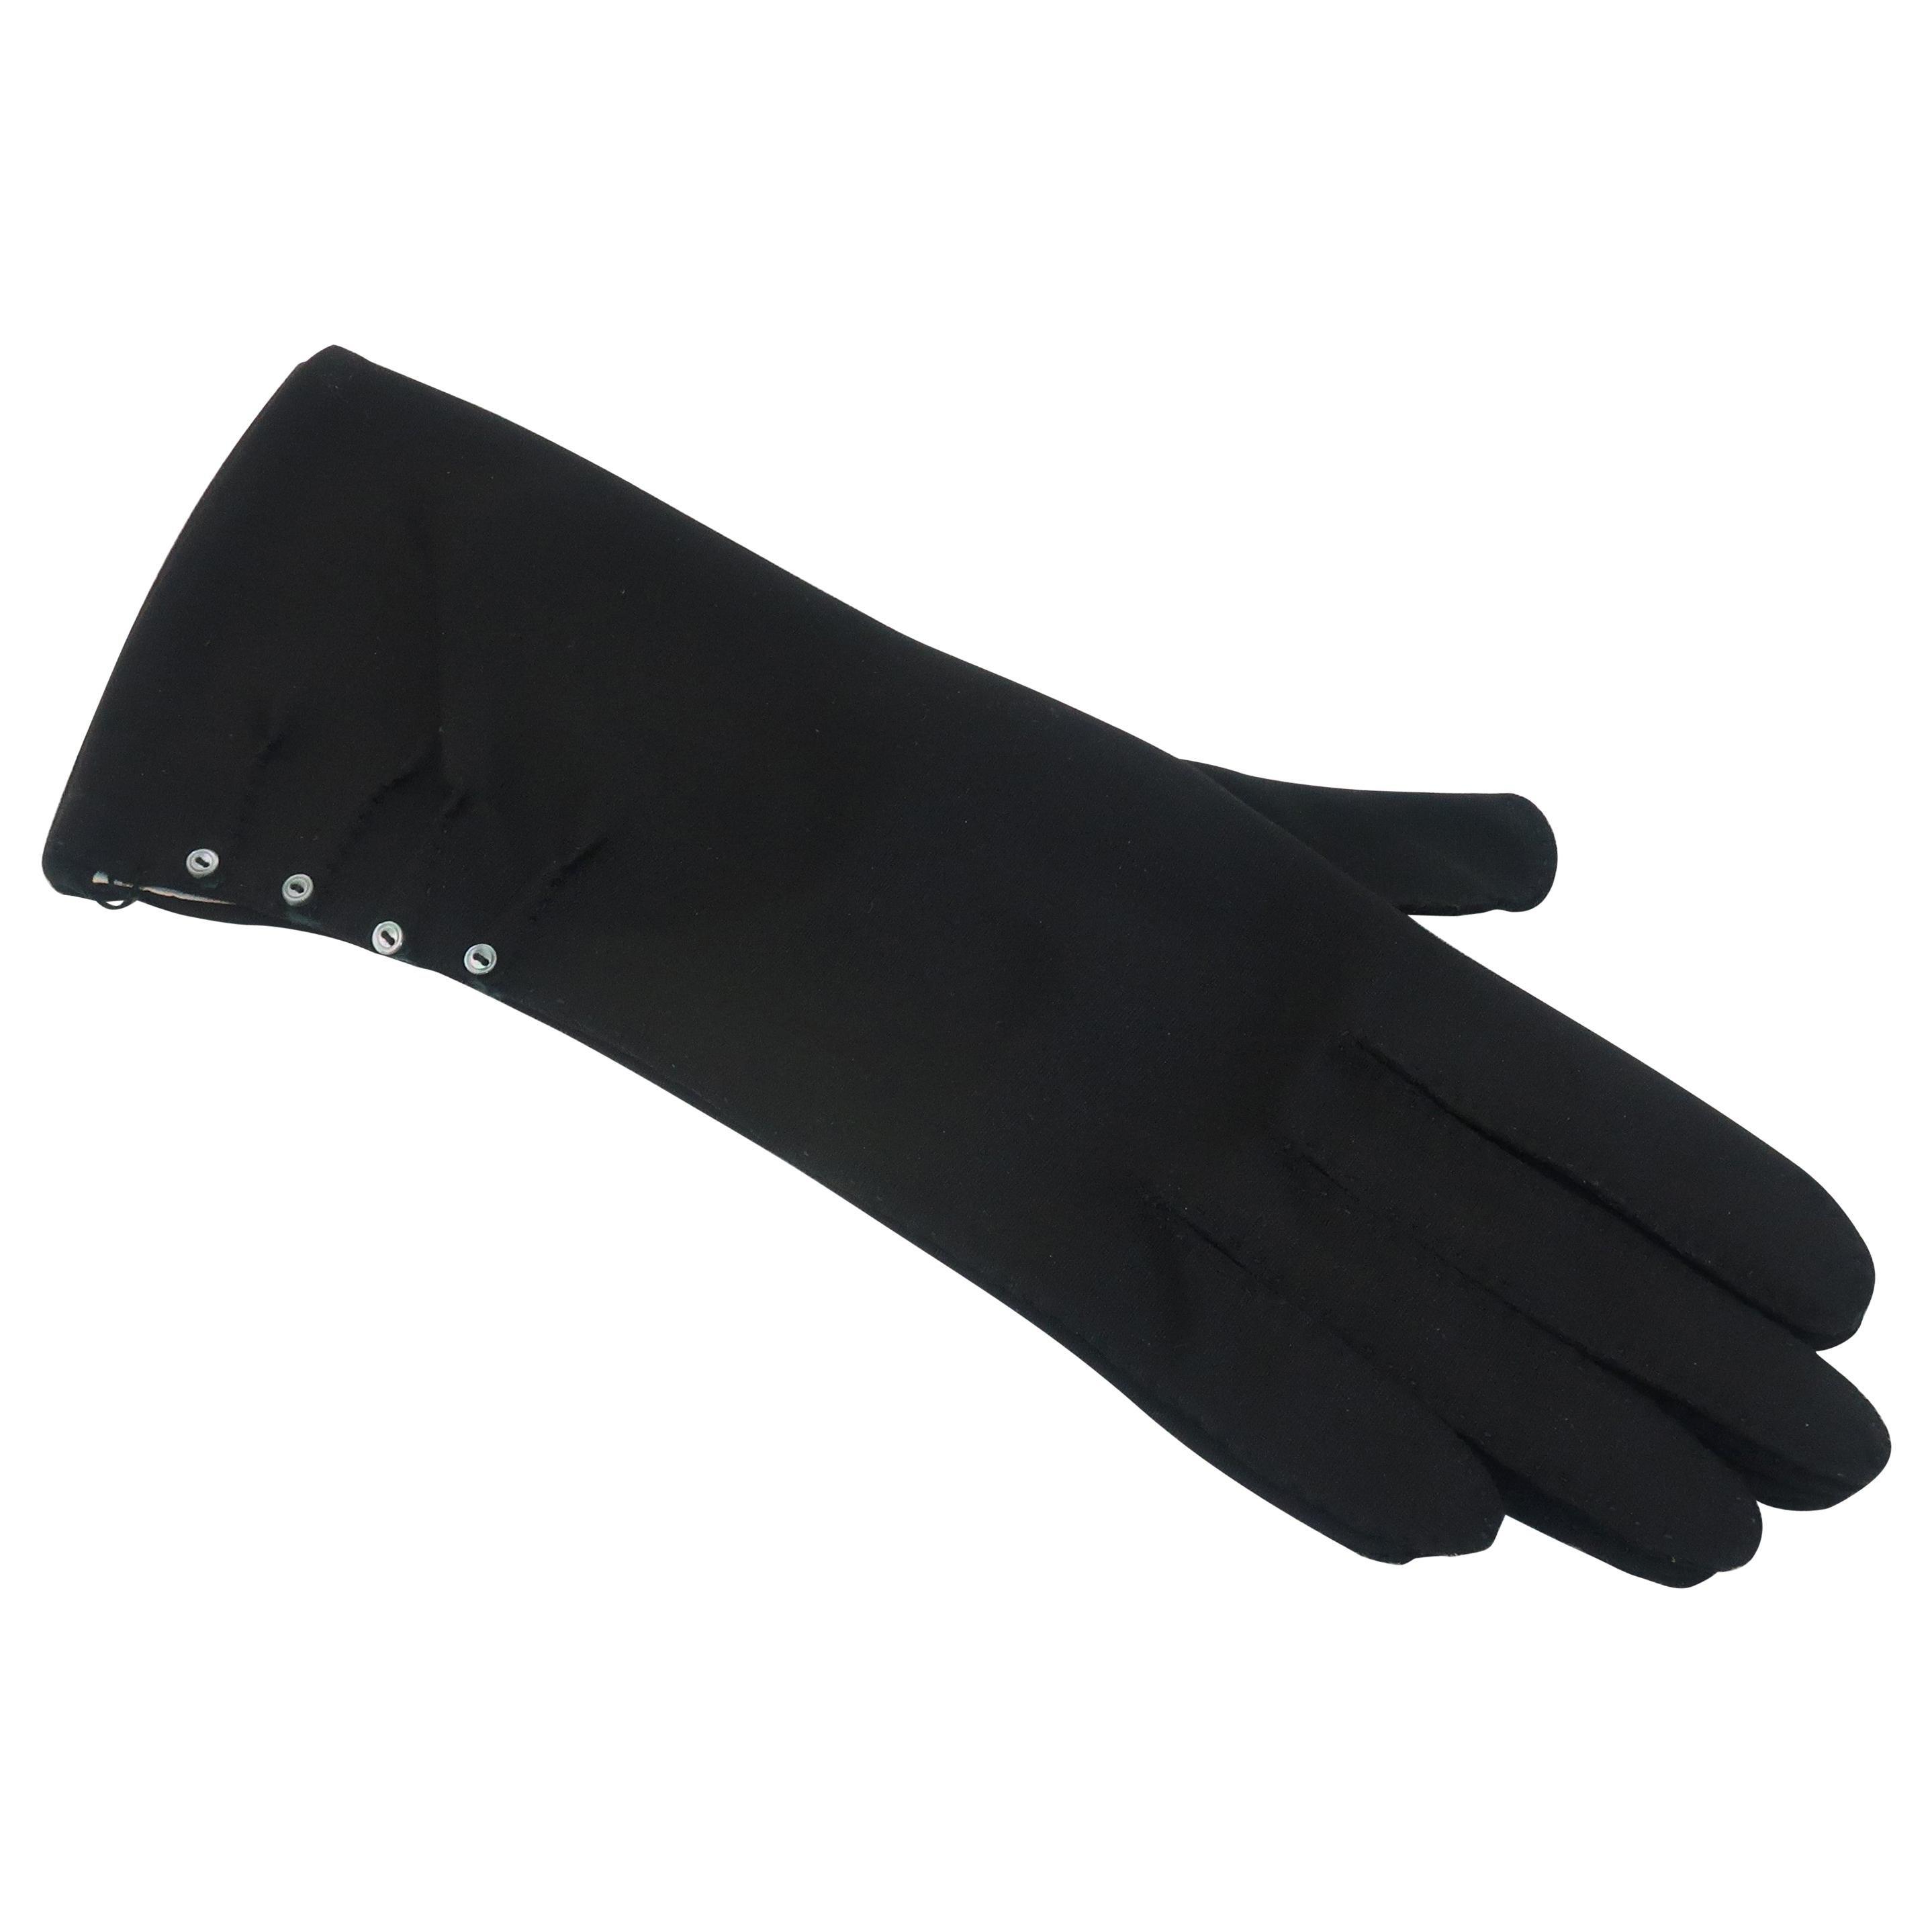 Van Raalte Black Nylon Gloves With Buttons, C.1950